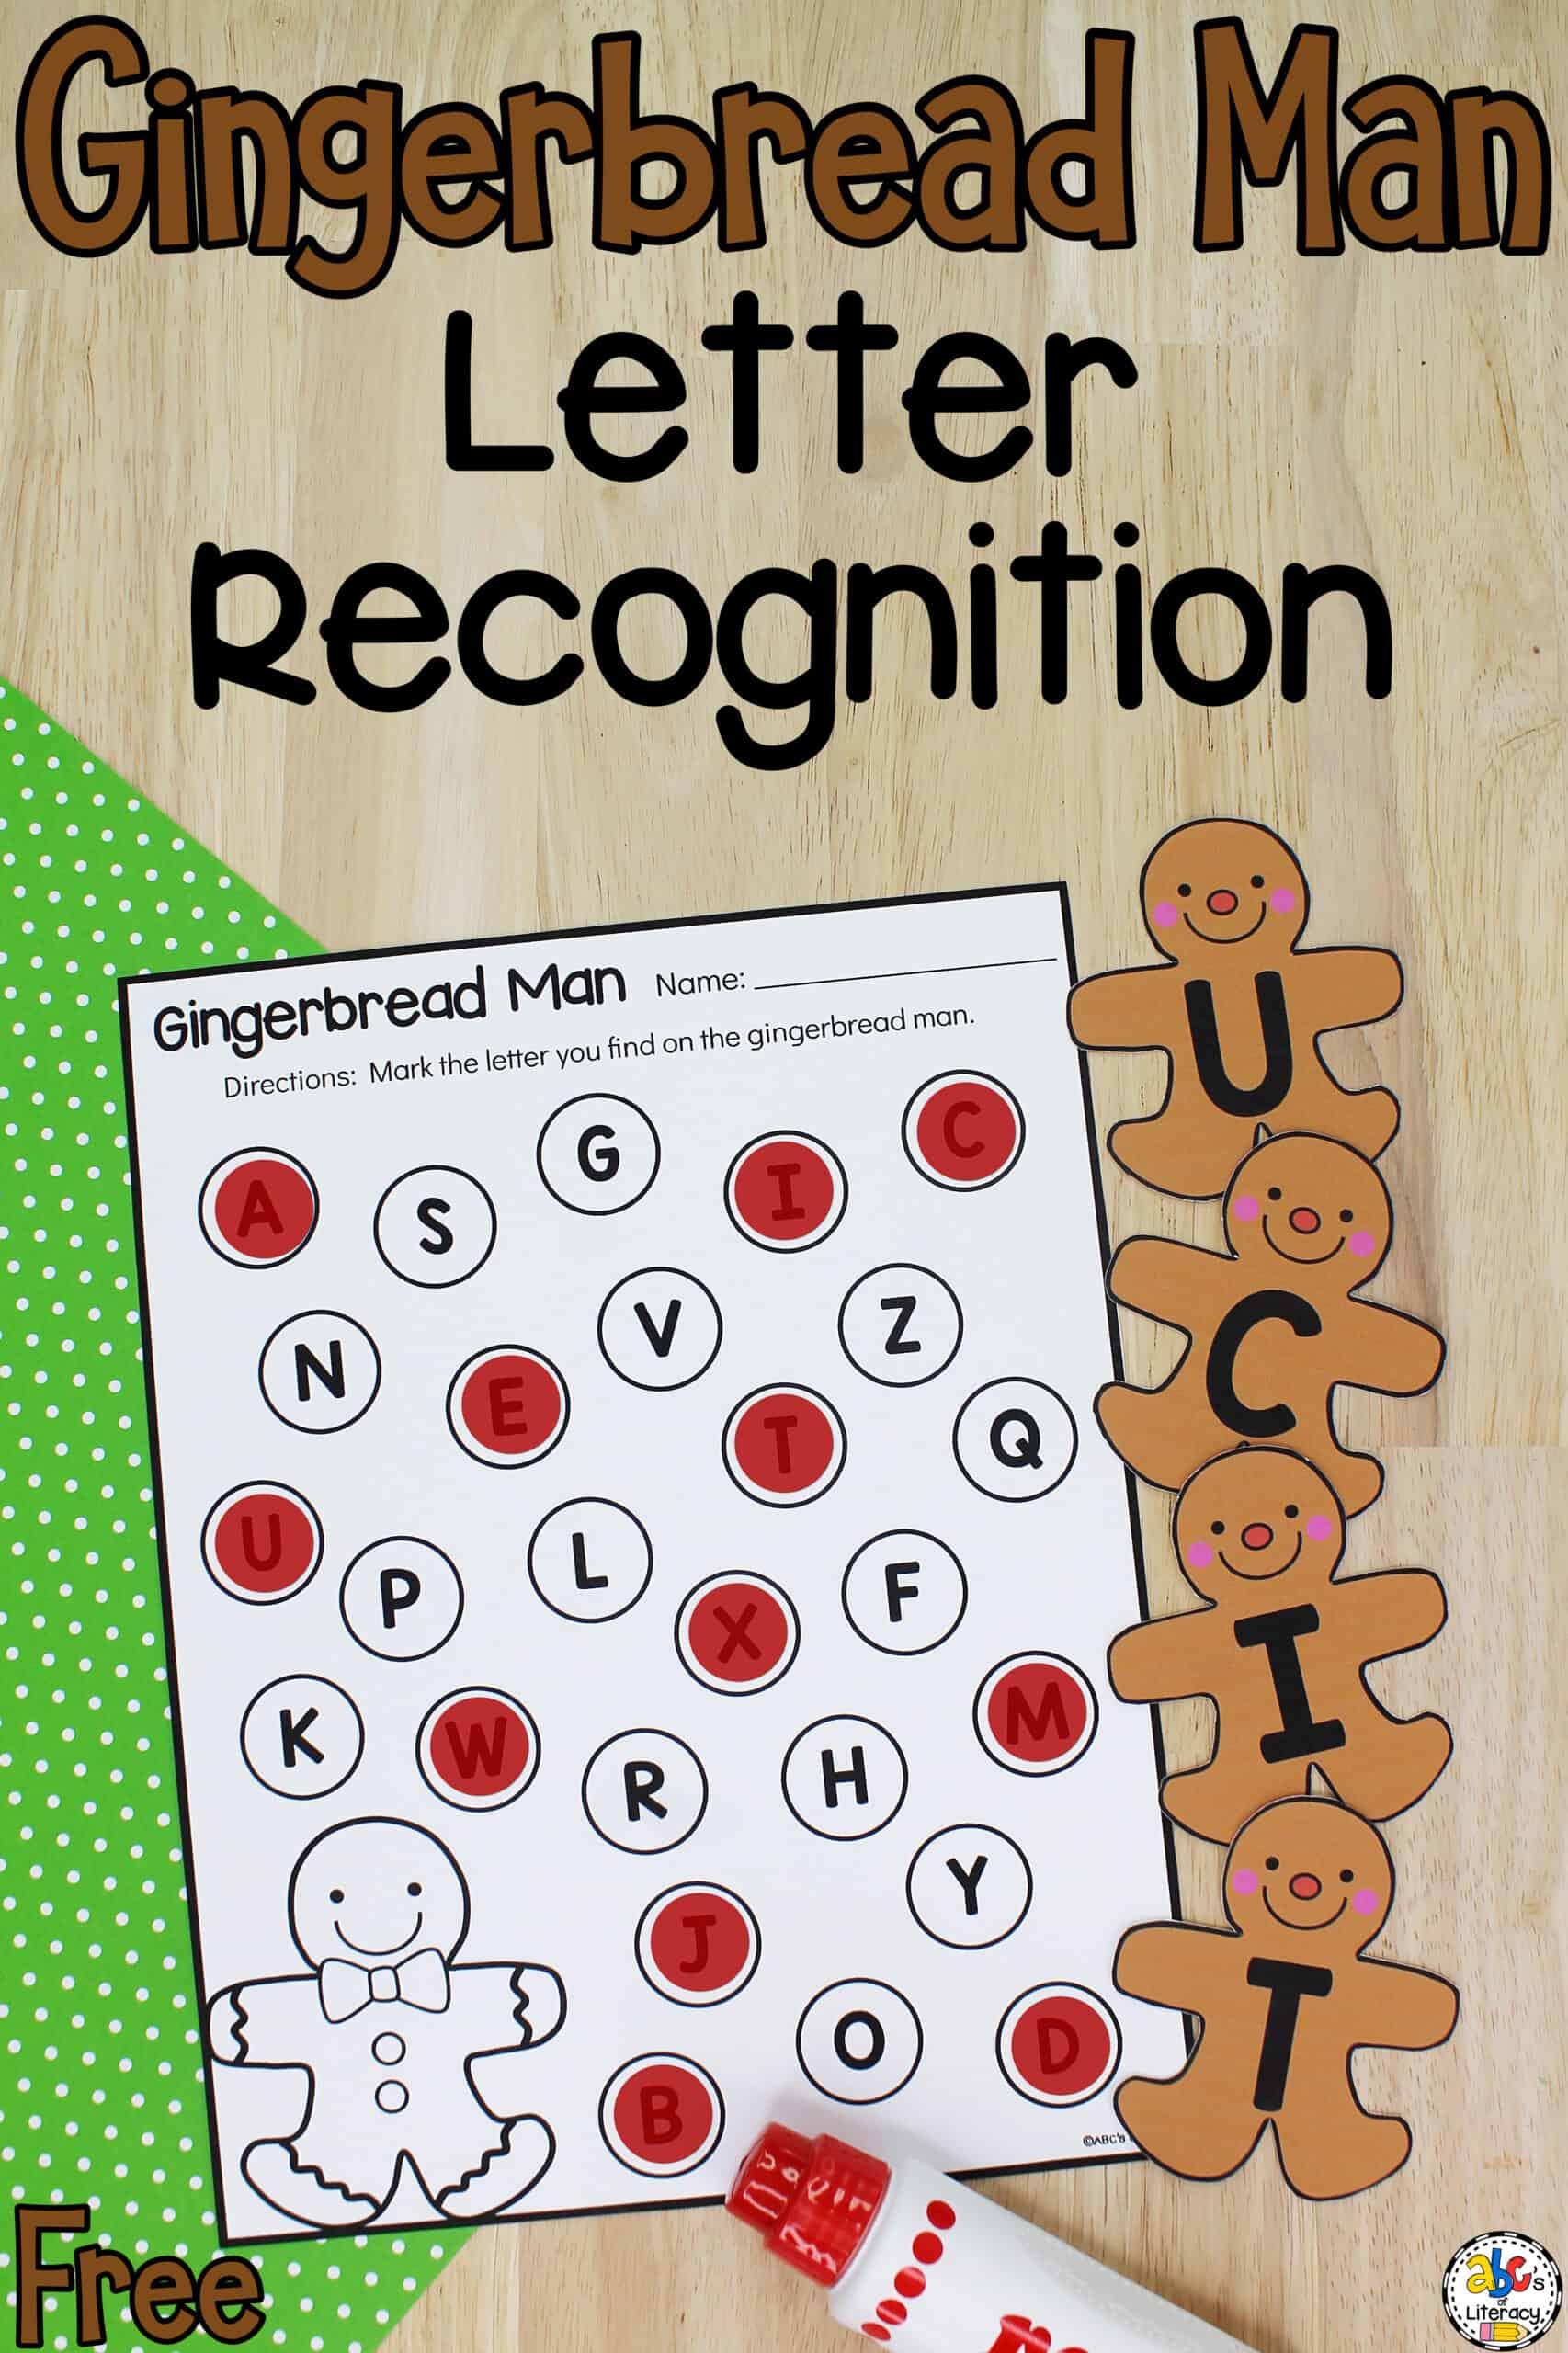 Gingerbread Man Alphabet Sensory Bin